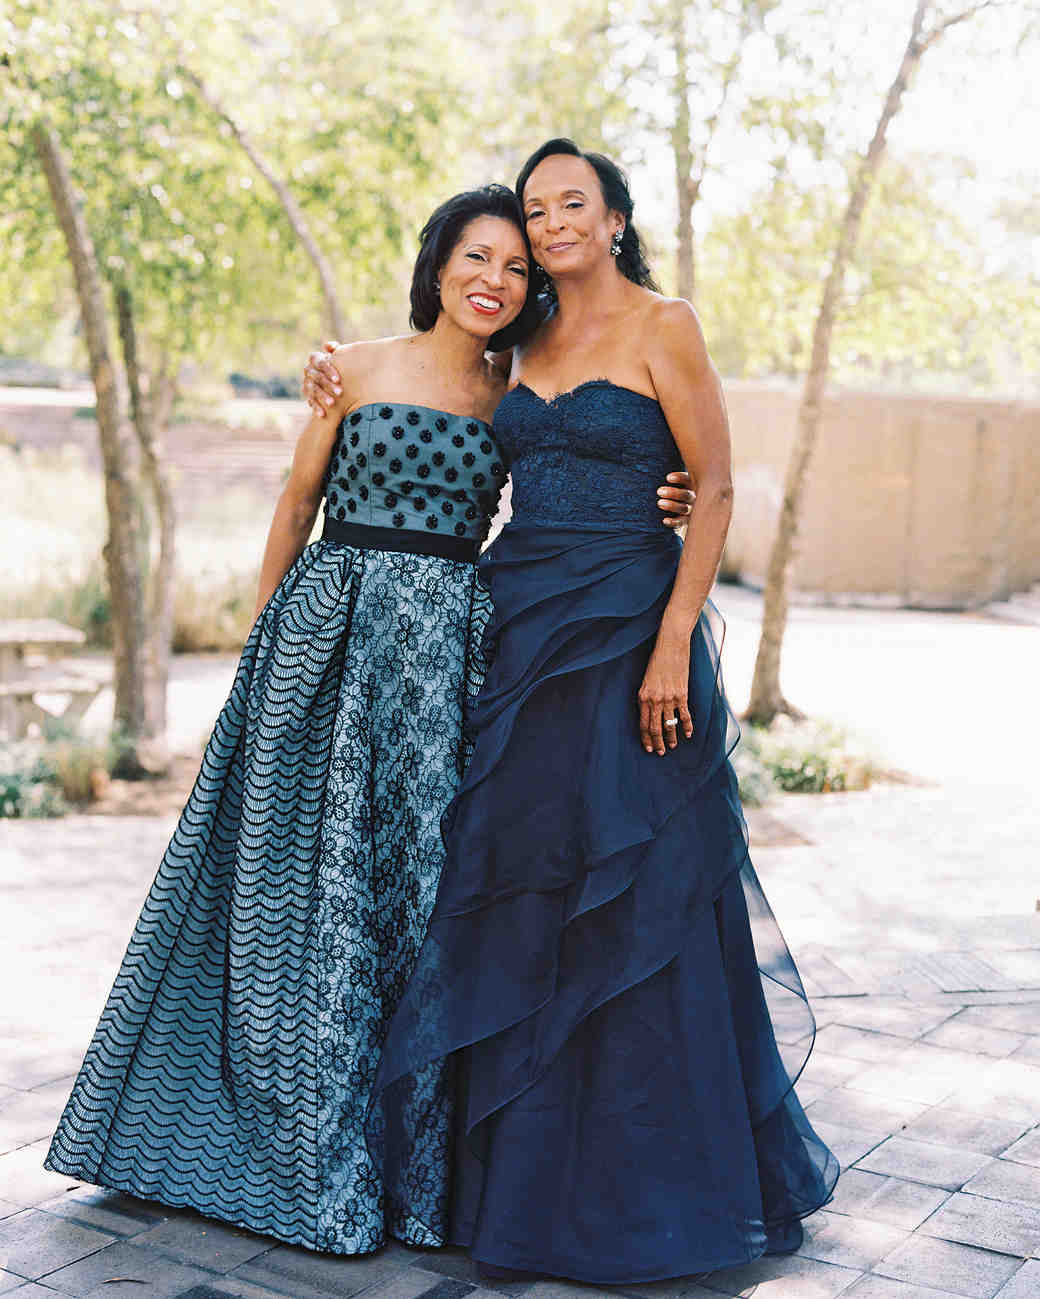 Formal Wedding Attire for Women